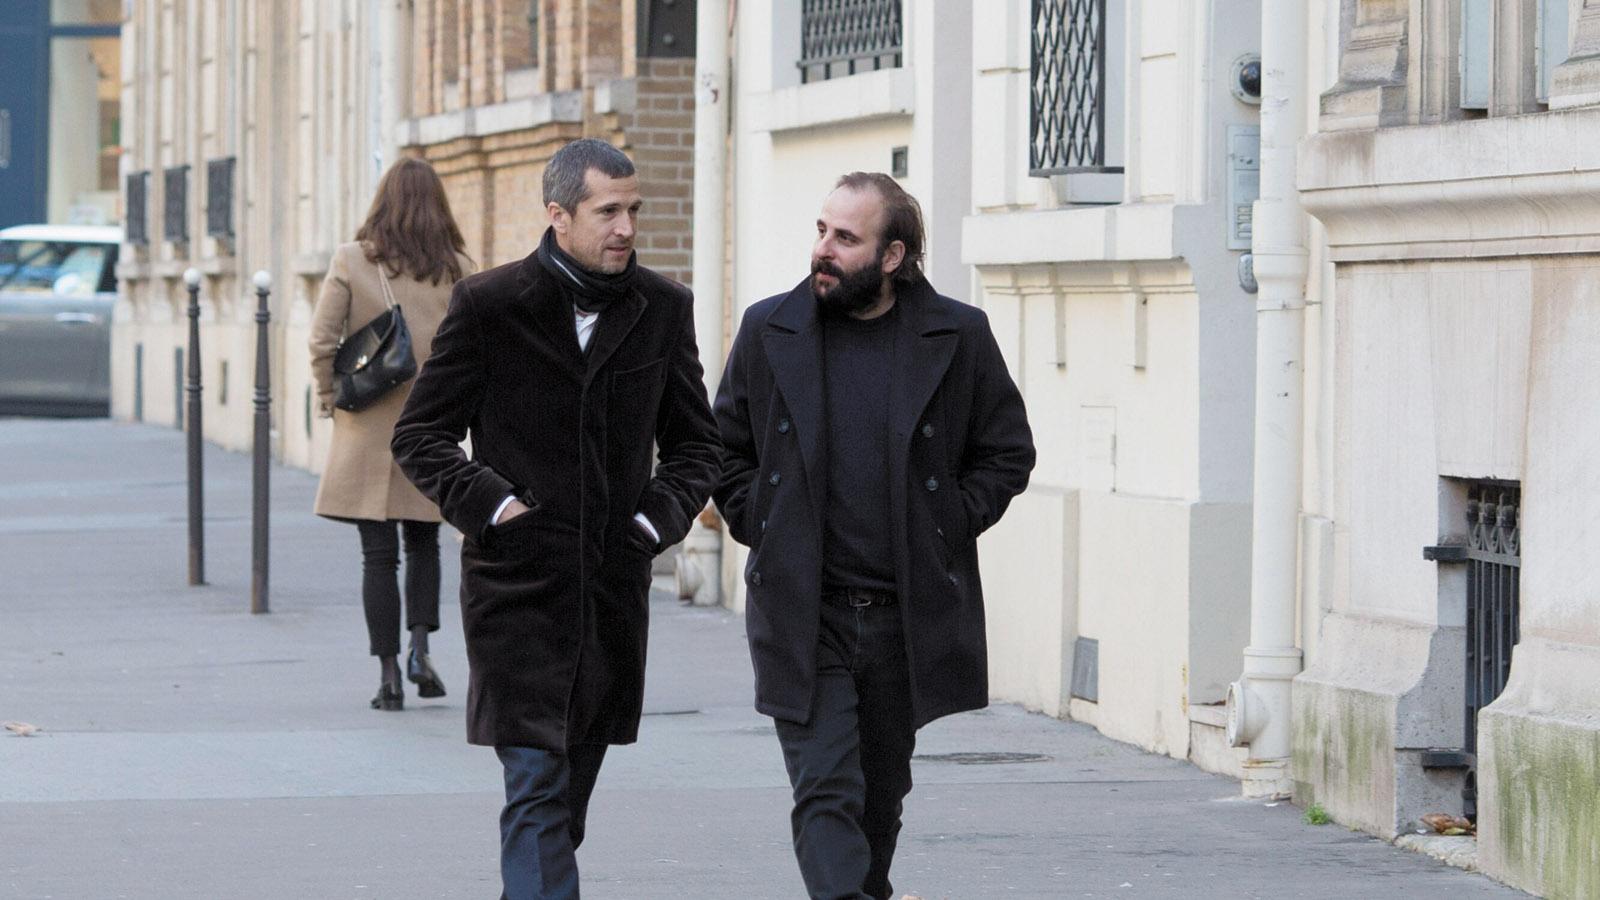 Guillaume Canet (left) as Alain and Vincent Macaigne as Léonard in Non-Fiction